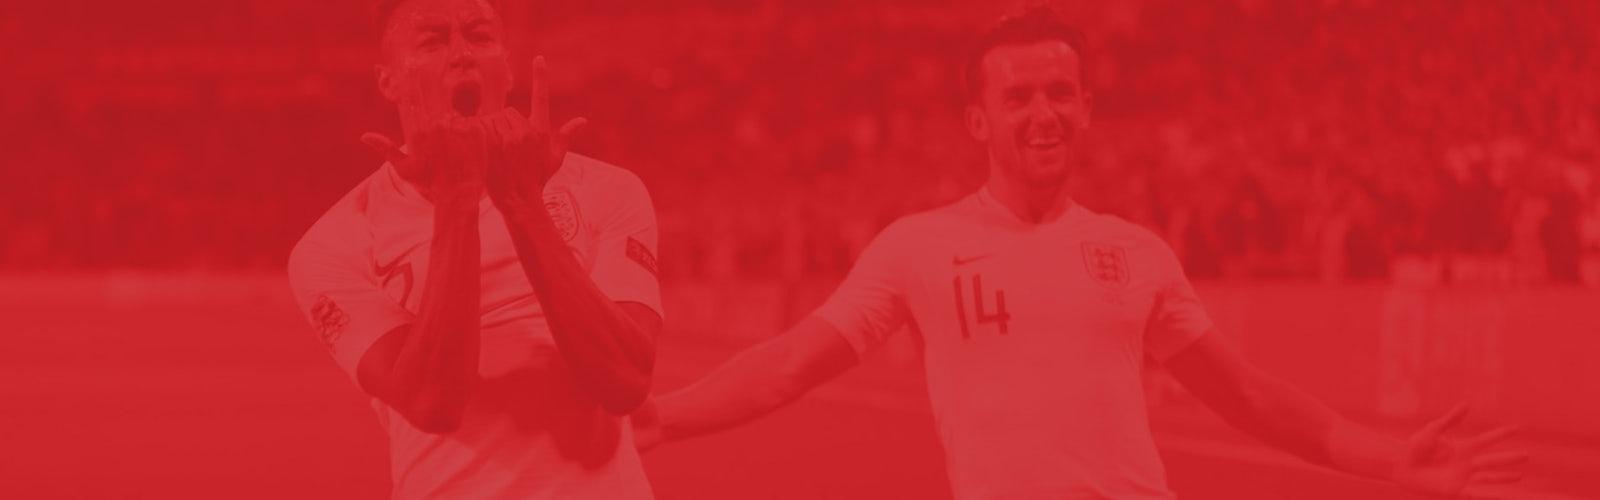 England football header image